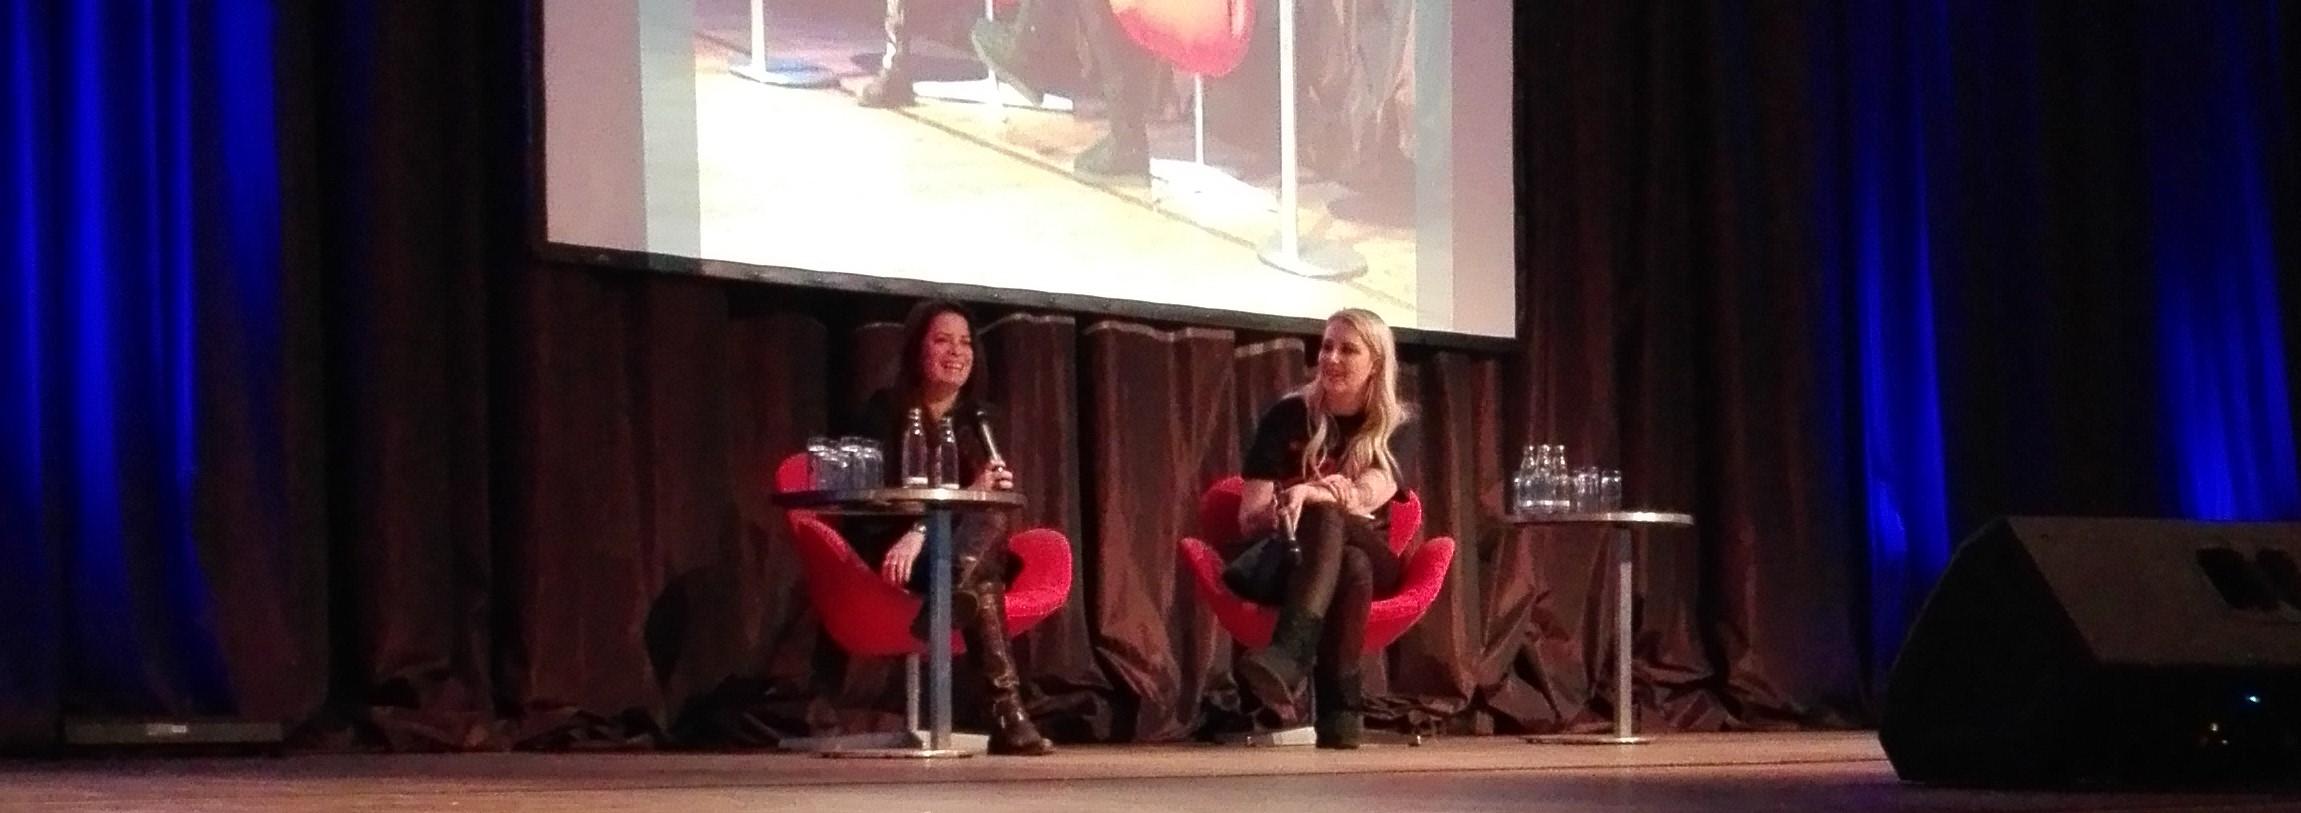 Isabel im Gespräch mit Holly Marie Combs Bild: Désirée Wilde / bonnFM